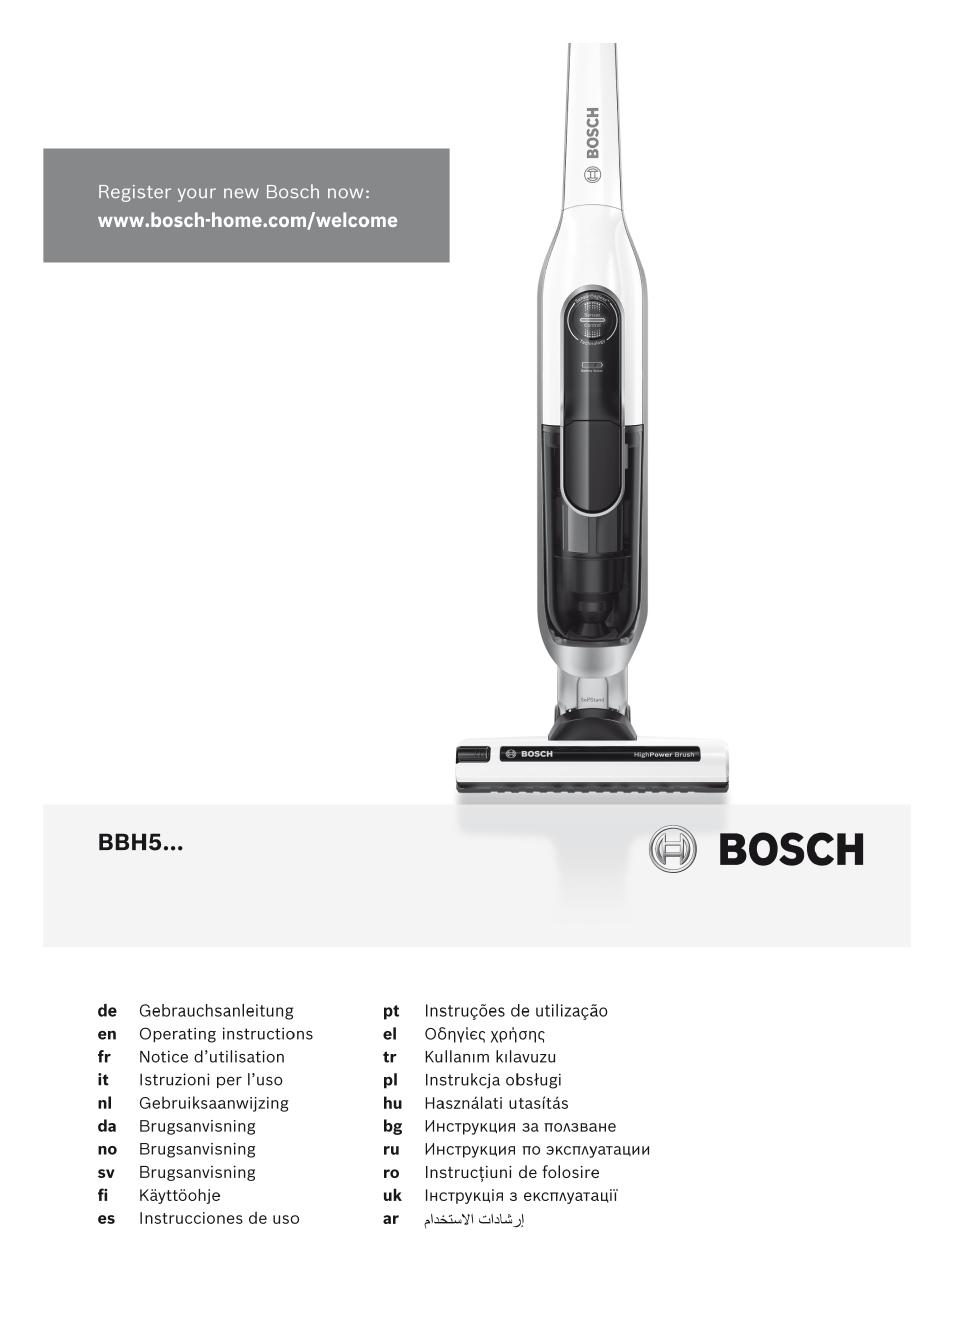 bosch lithiumpower 25 2v aspirateur balai sans fil rechargeable bbh52550 argent min ral user